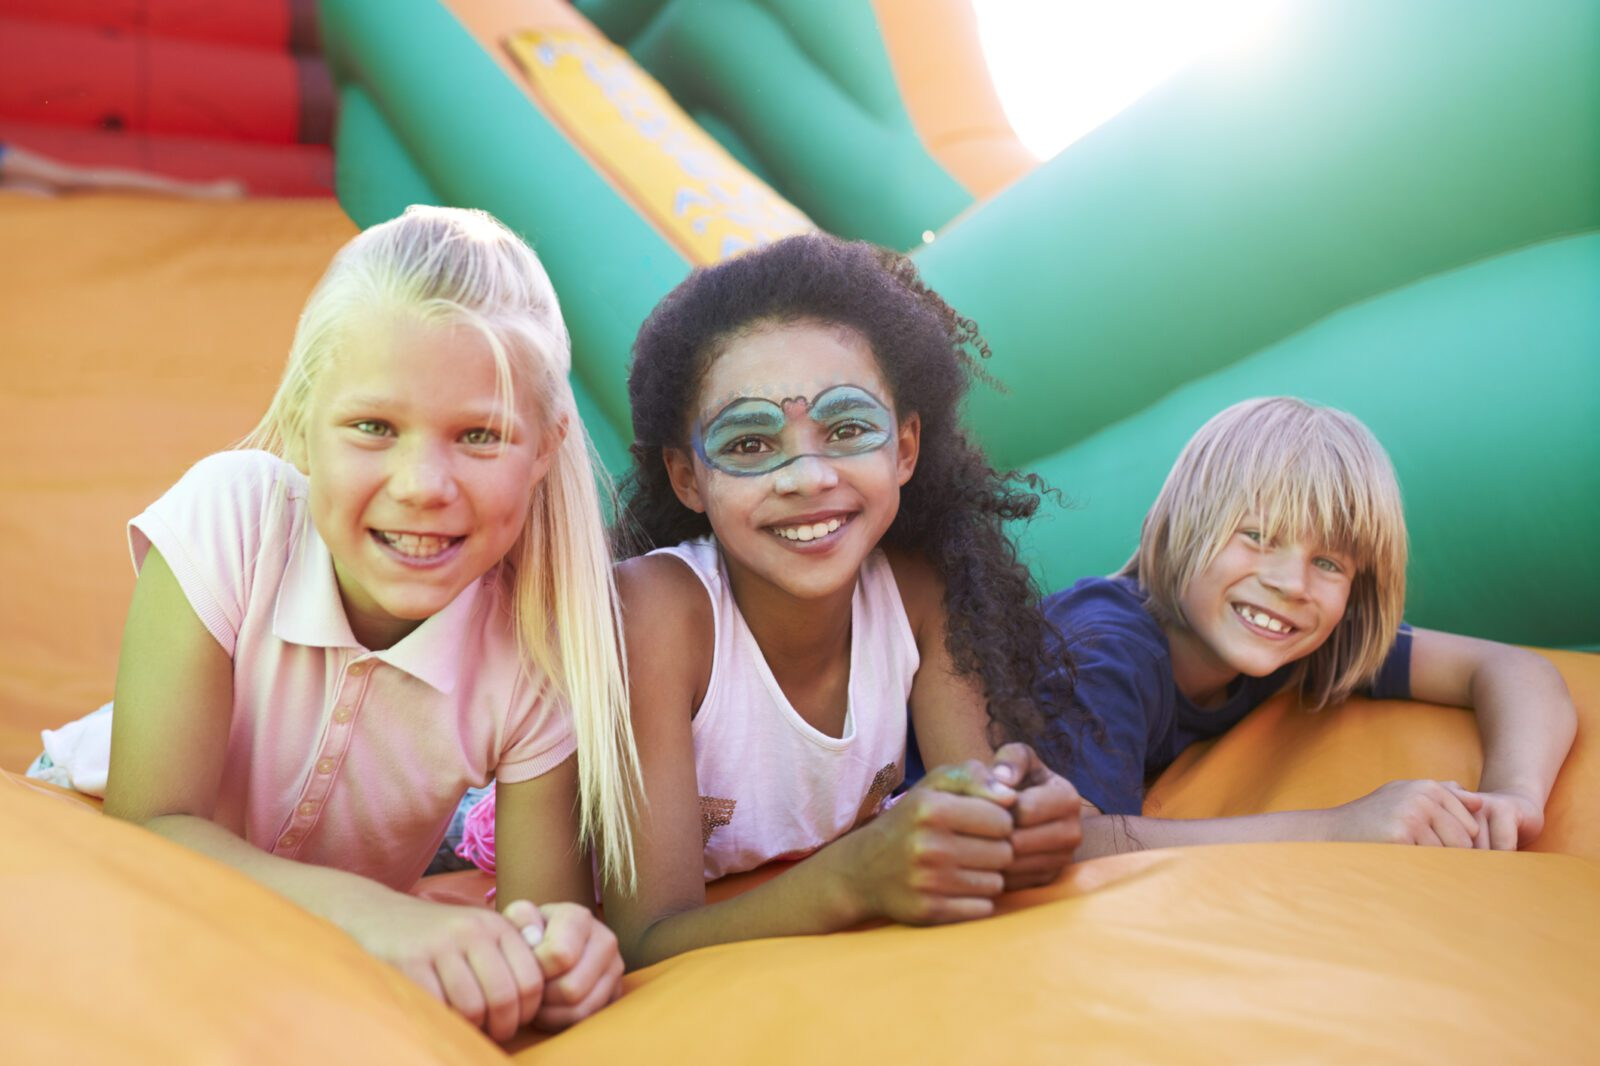 kids on bounce house